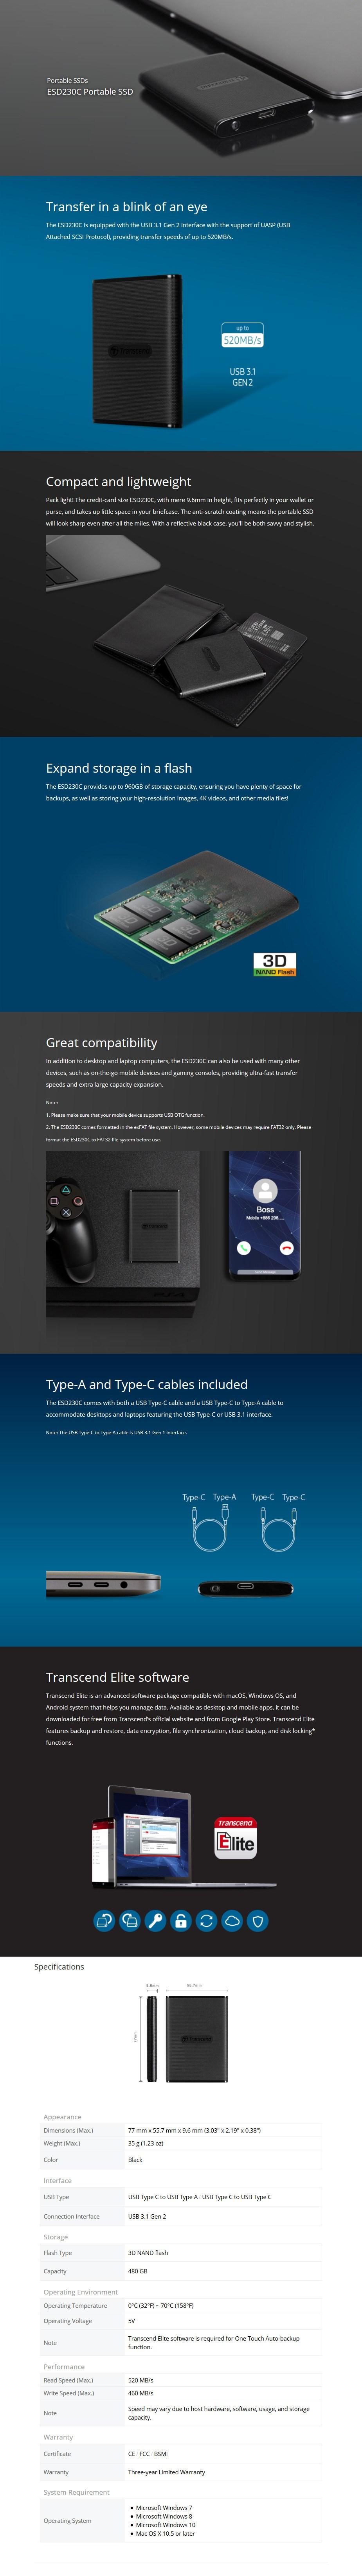 Transcend ESD230C 480GB External Portable USB 3.1 Type C SSD - Desktop Overview 1